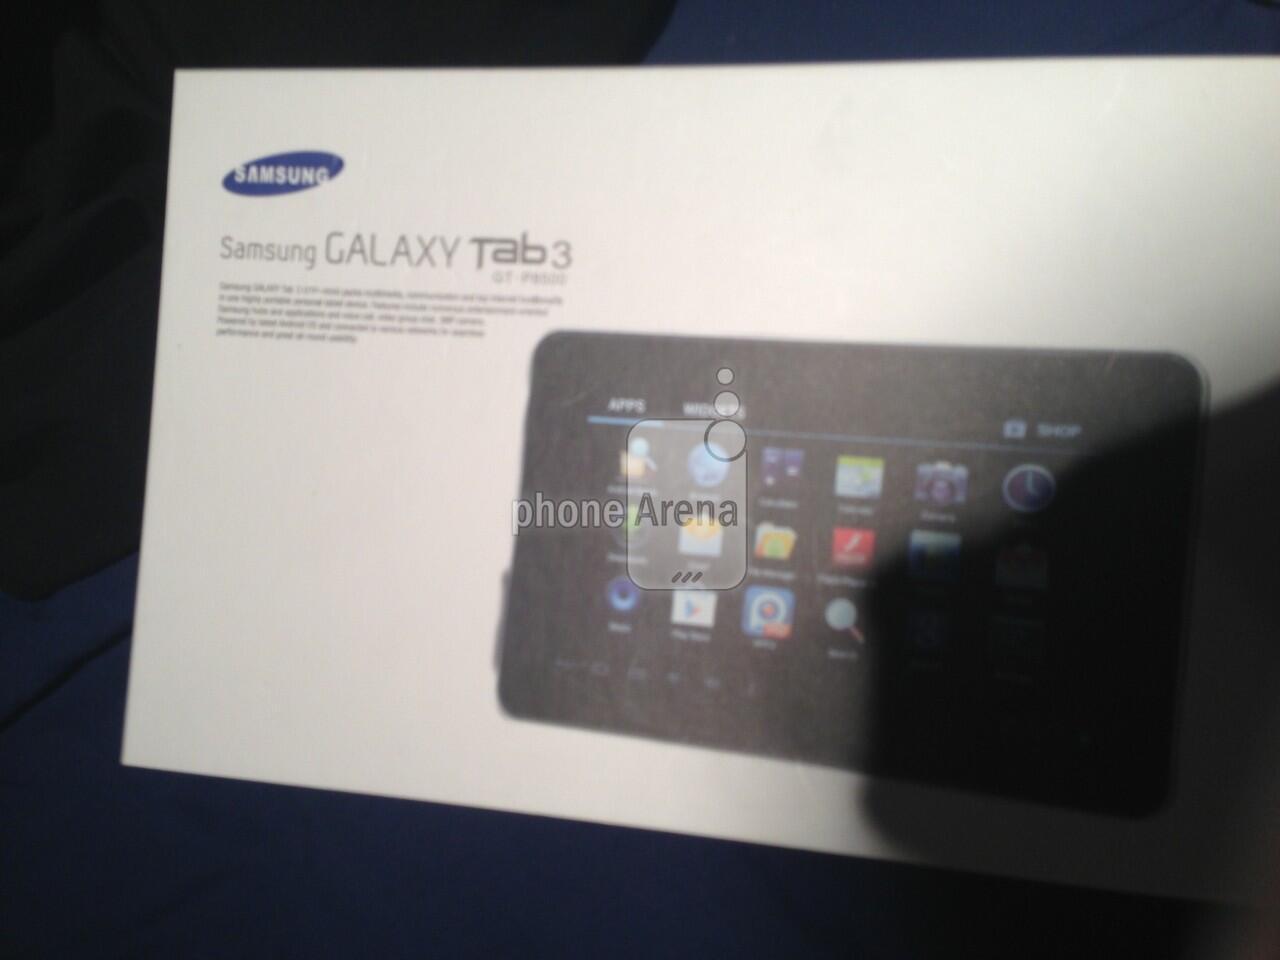 Android foto galaxy tab 3 Samsung